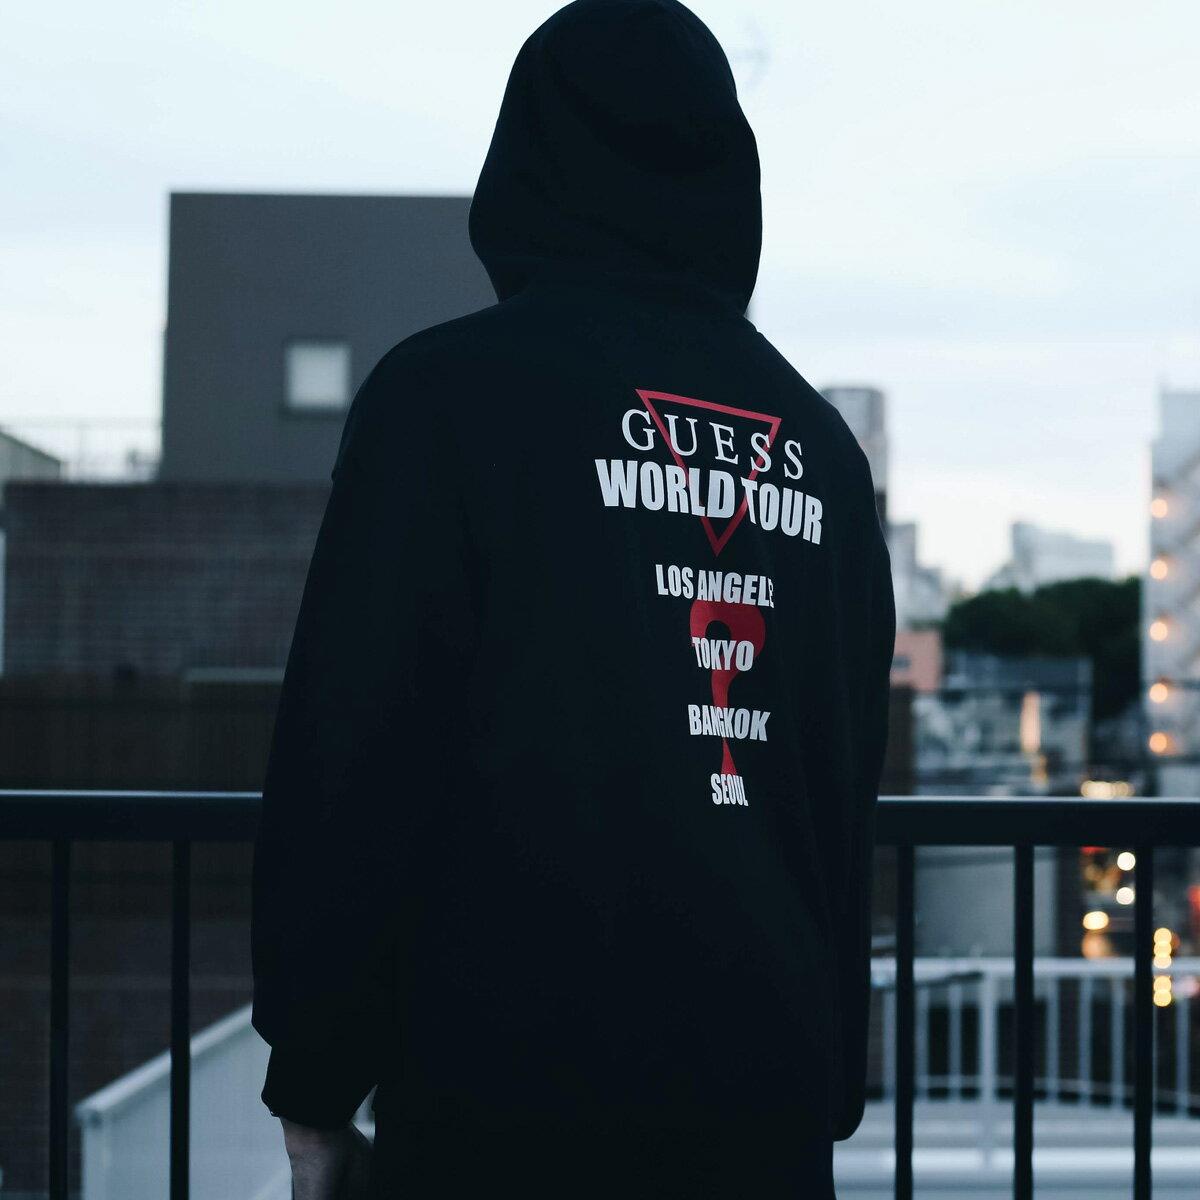 GUESS × atmos MEN'S L/SLV HOODIES WORLD TOUR(ゲス メンズ ロングスリーブ フーディー ワールドツアー)BLACK18FW-S